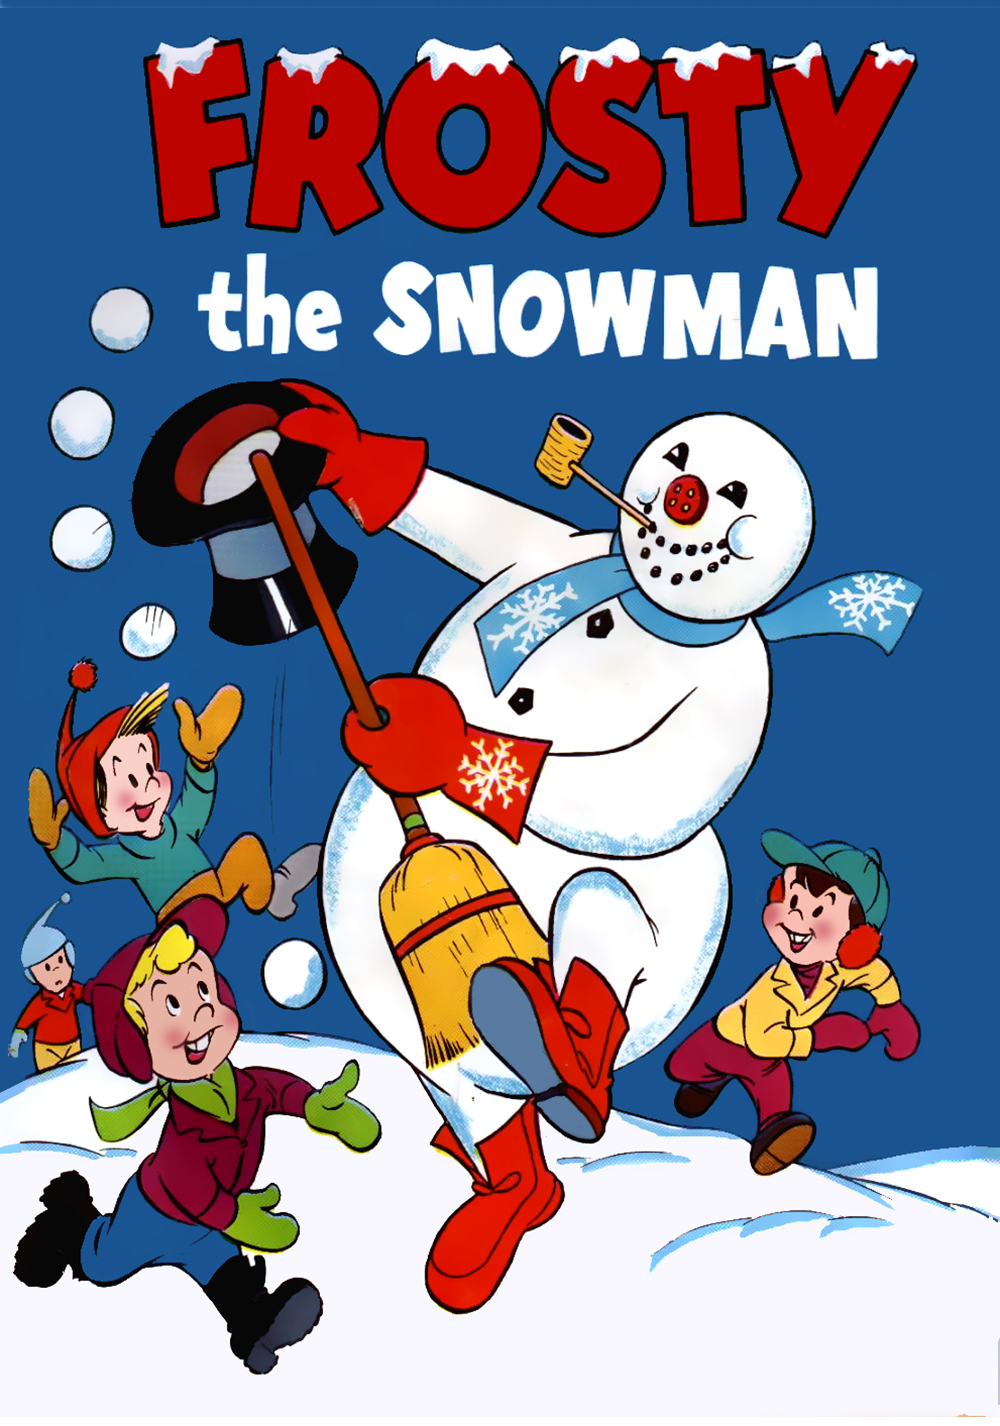 Uncategorized Frosty The Snowman Movie frosty the snowman movie fanart tv poster image